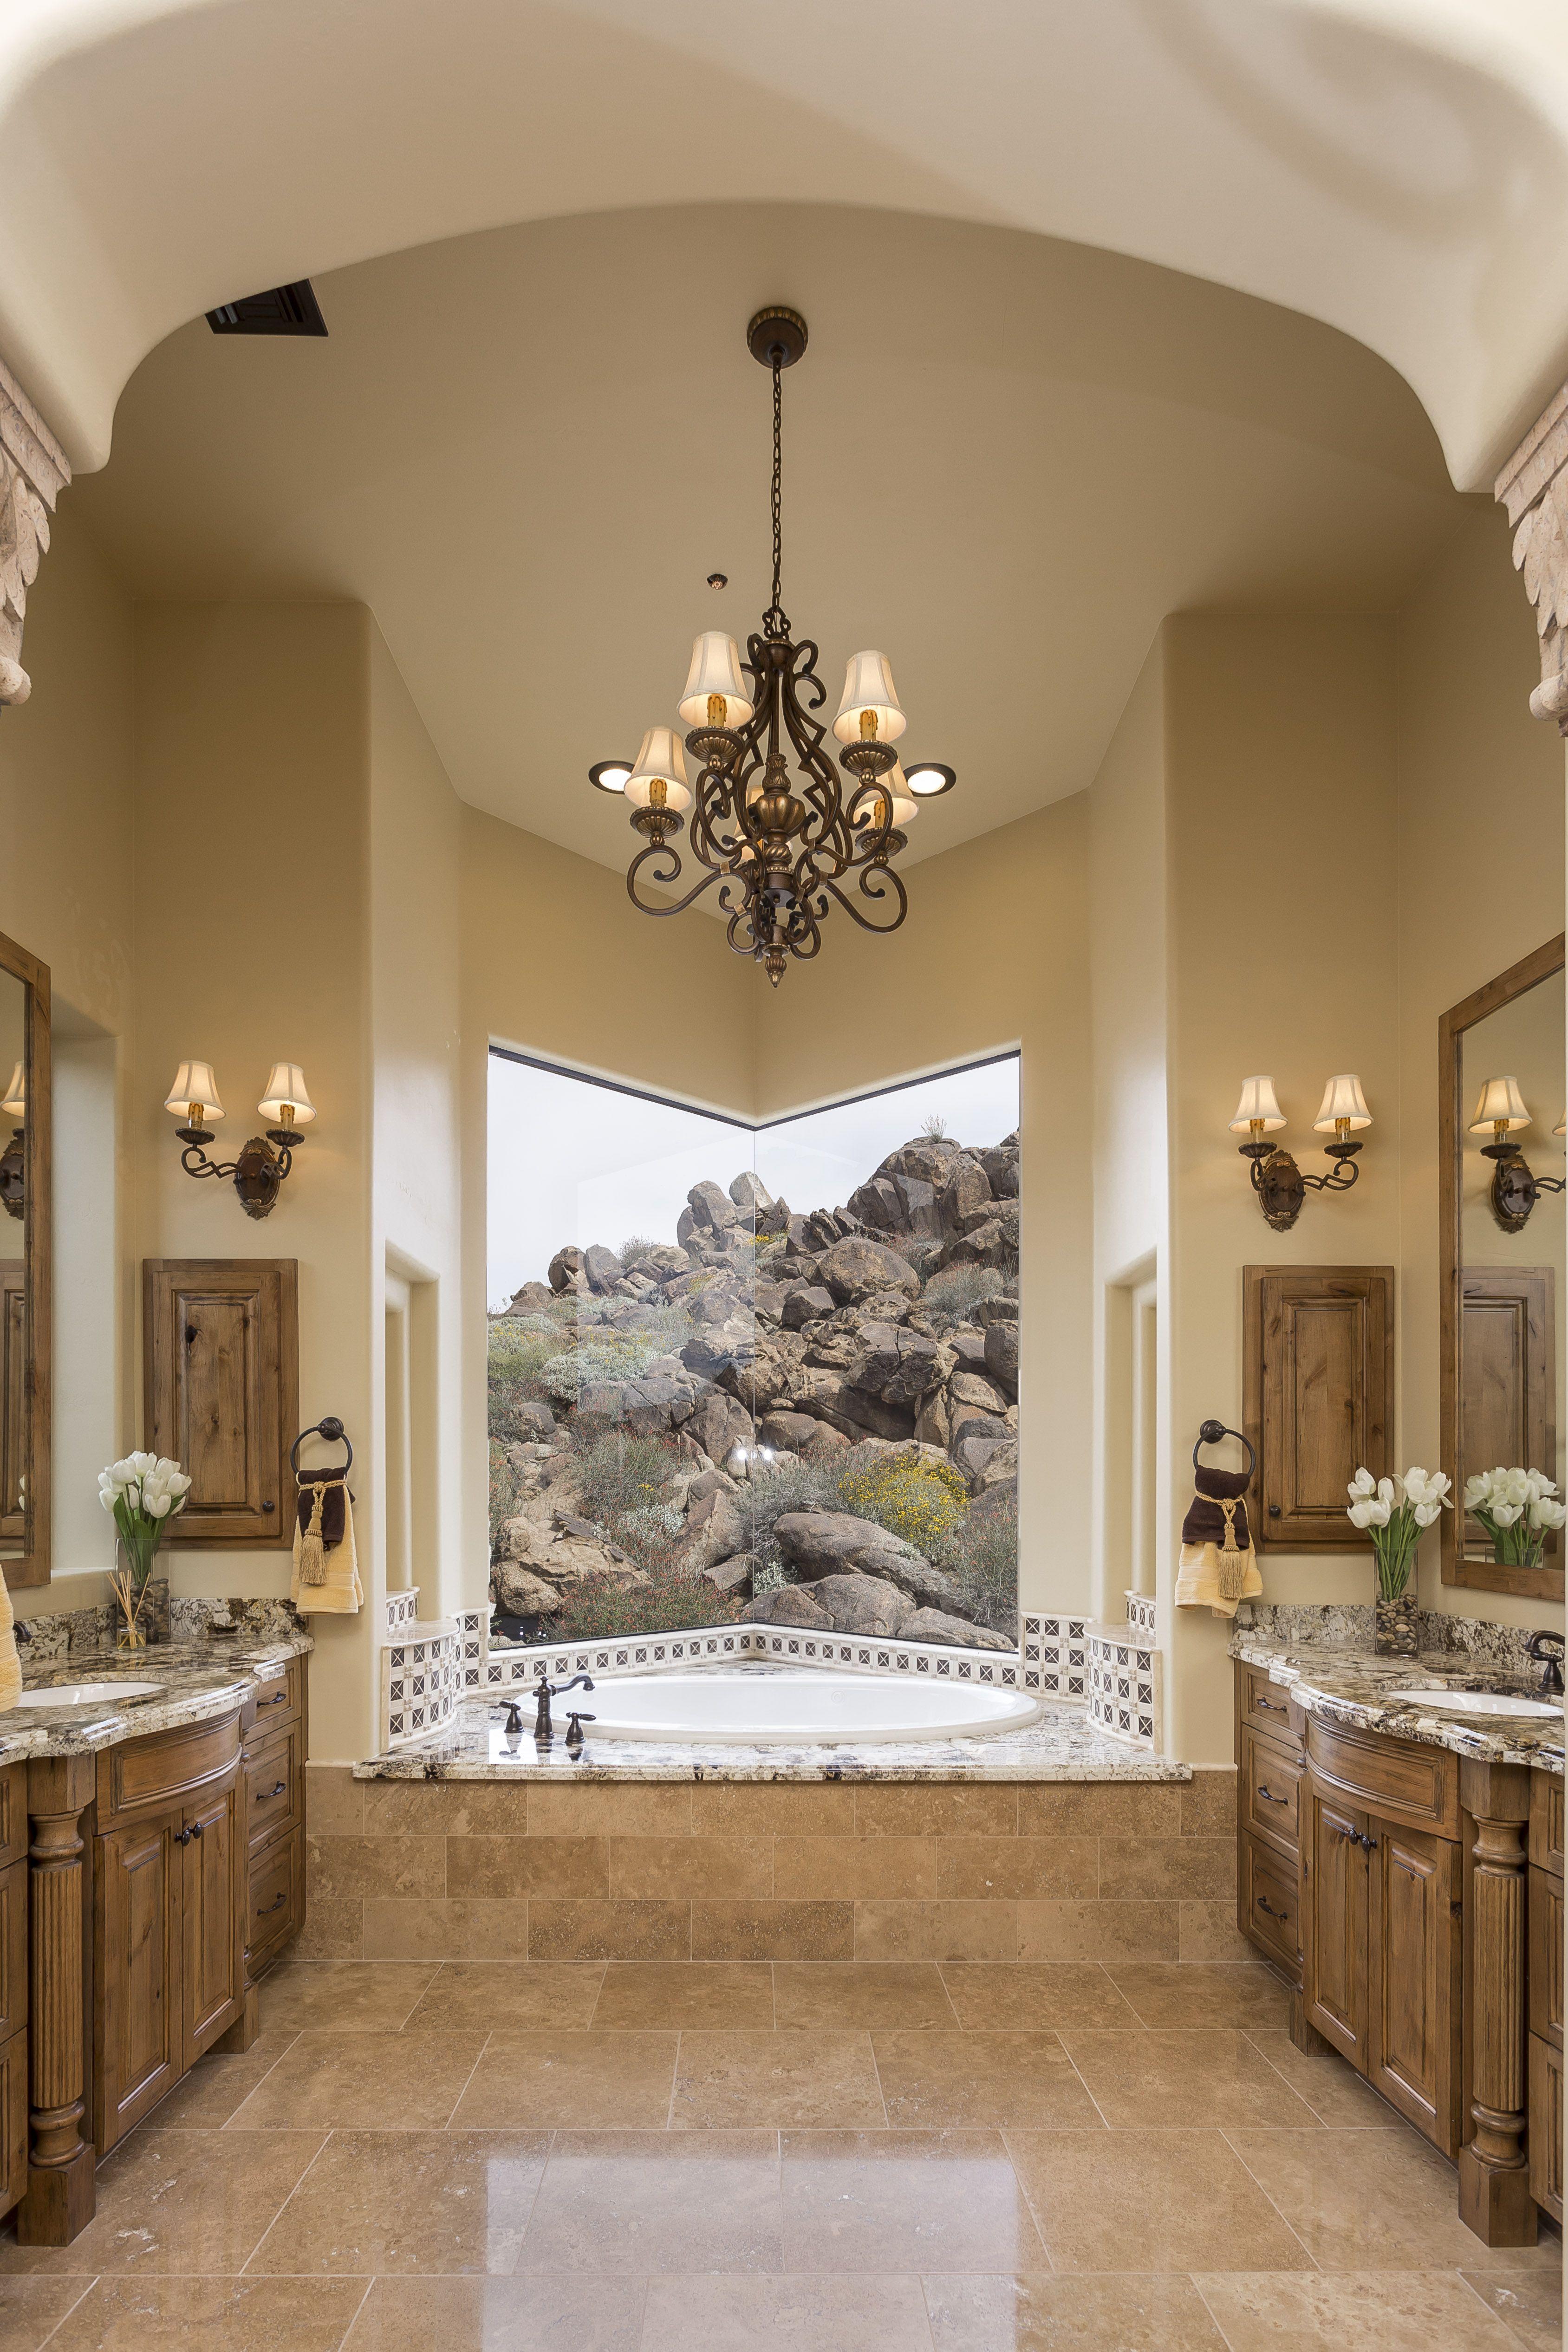 Photo On Butt glass window Master bath Chandelier Master suite custom Master bath